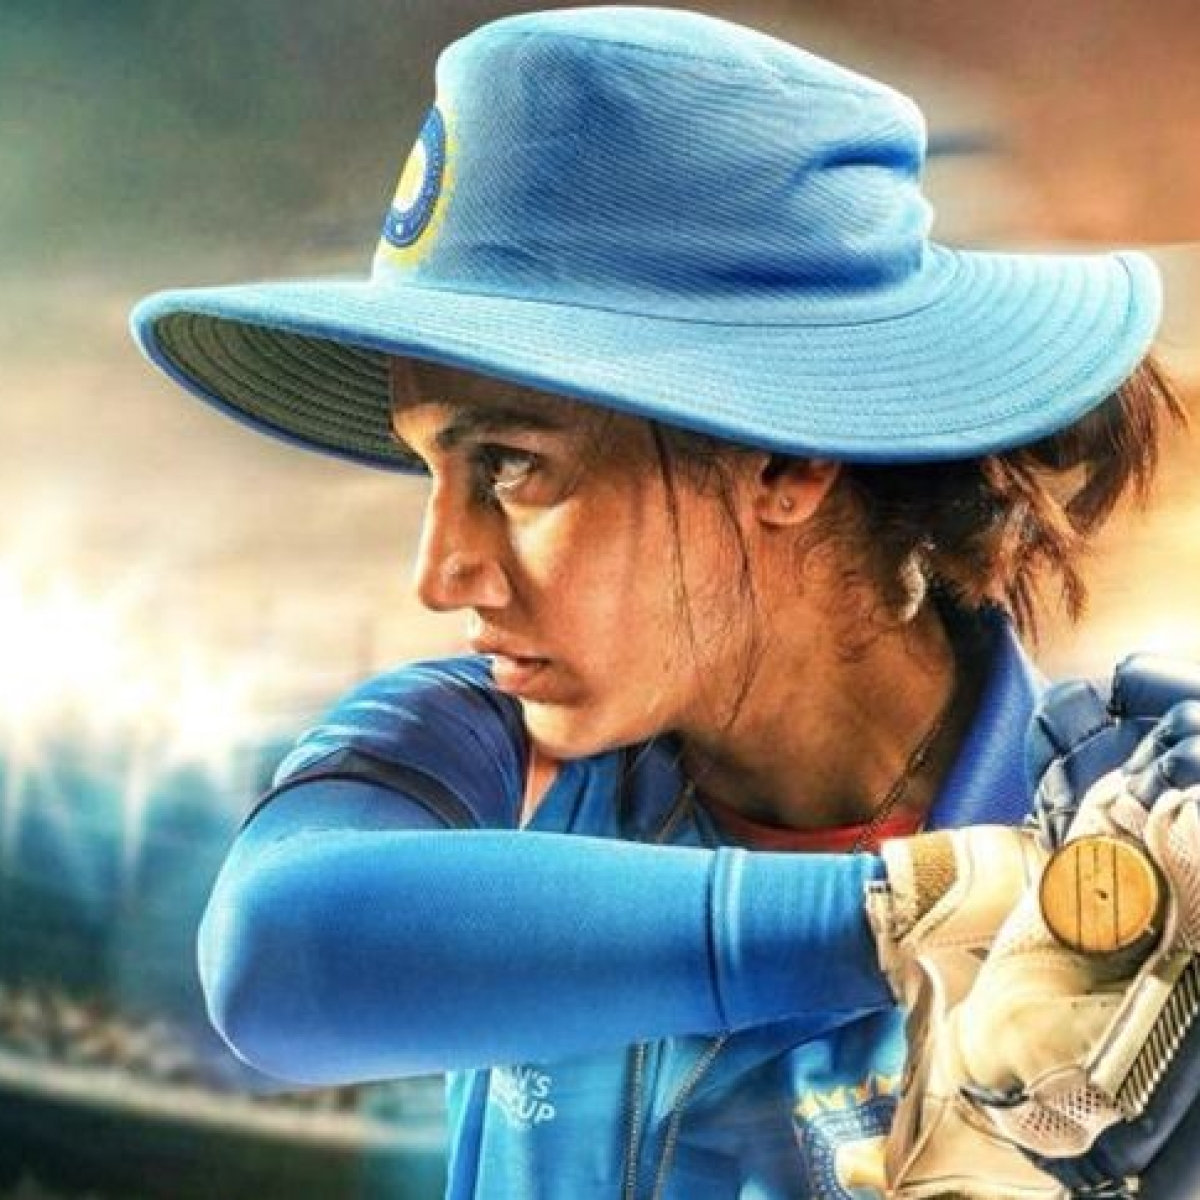 Shabaash Mithu: Taapsee Pannu transforms into cricketer Mithali Raj